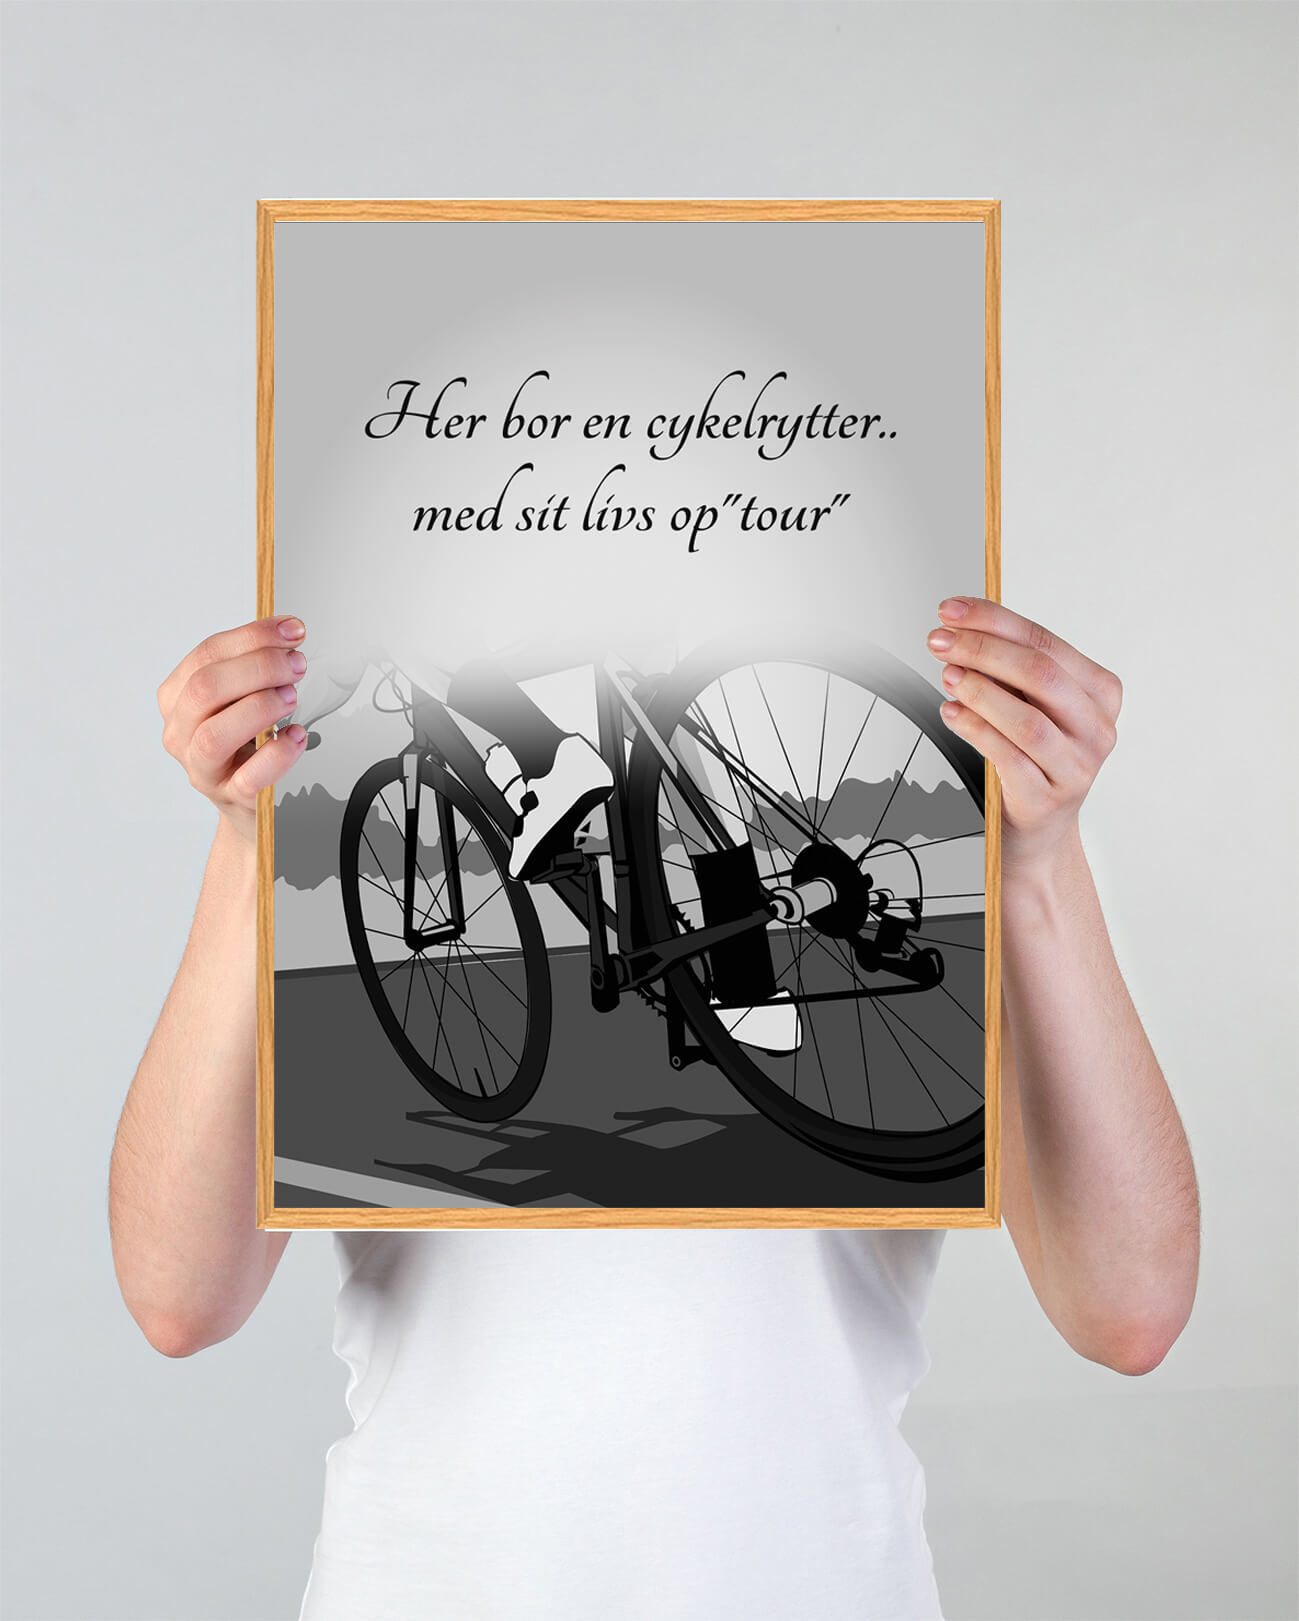 Cykelrytter-gaveide-1